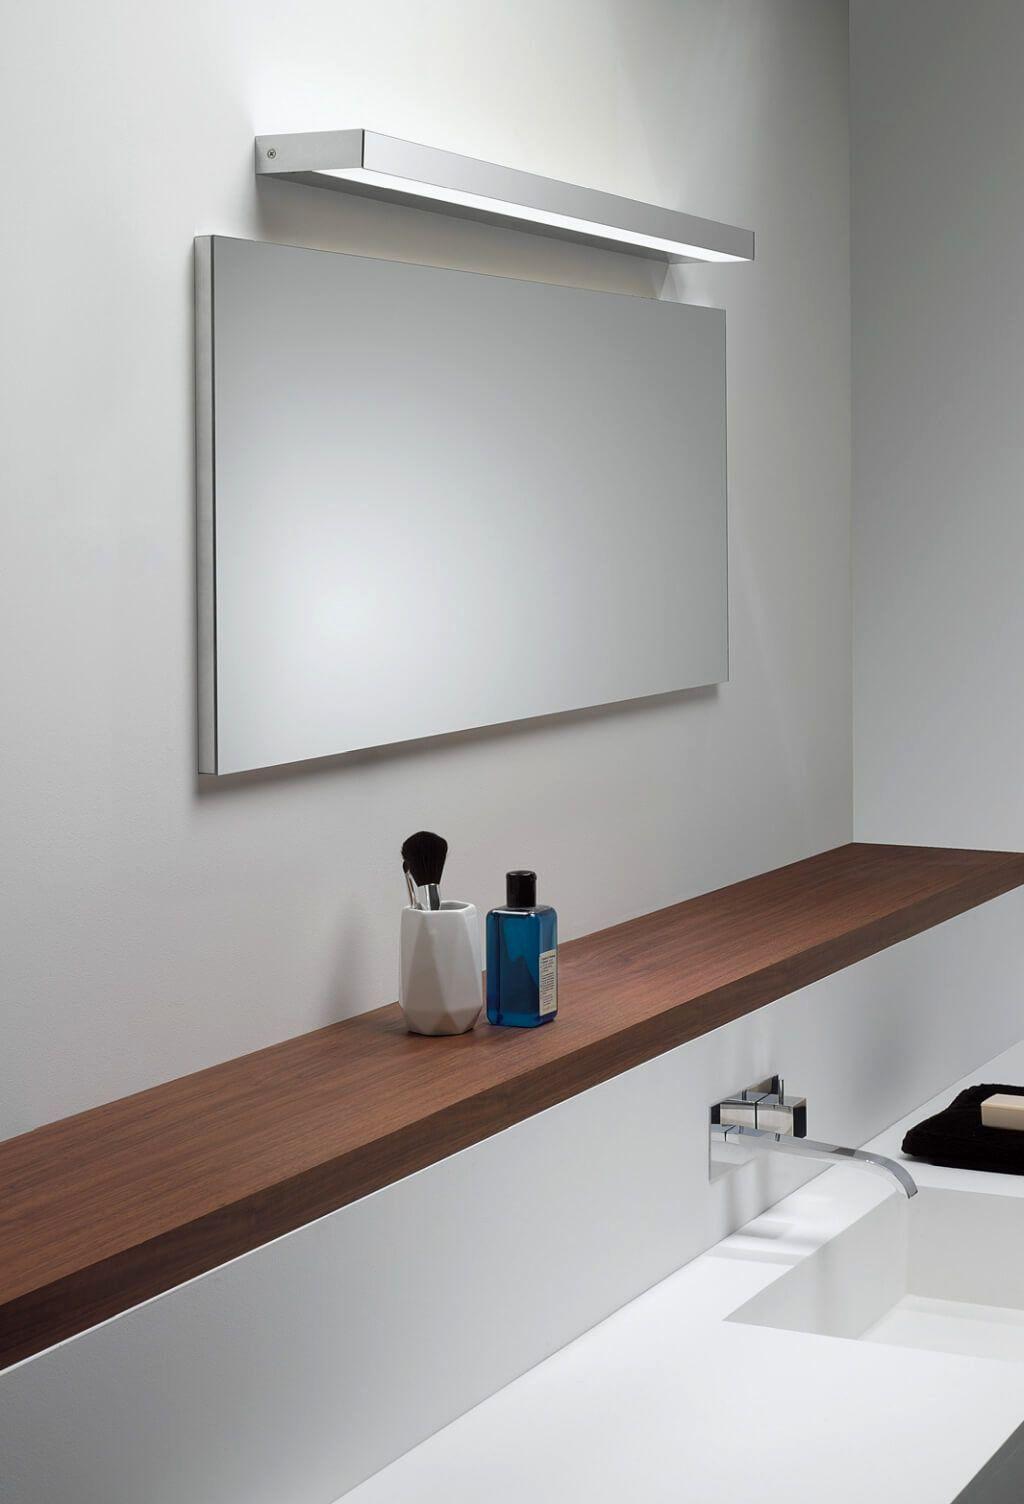 fascinating tile bathroom ideas online-Amazing Tile Bathroom Ideas Photograph